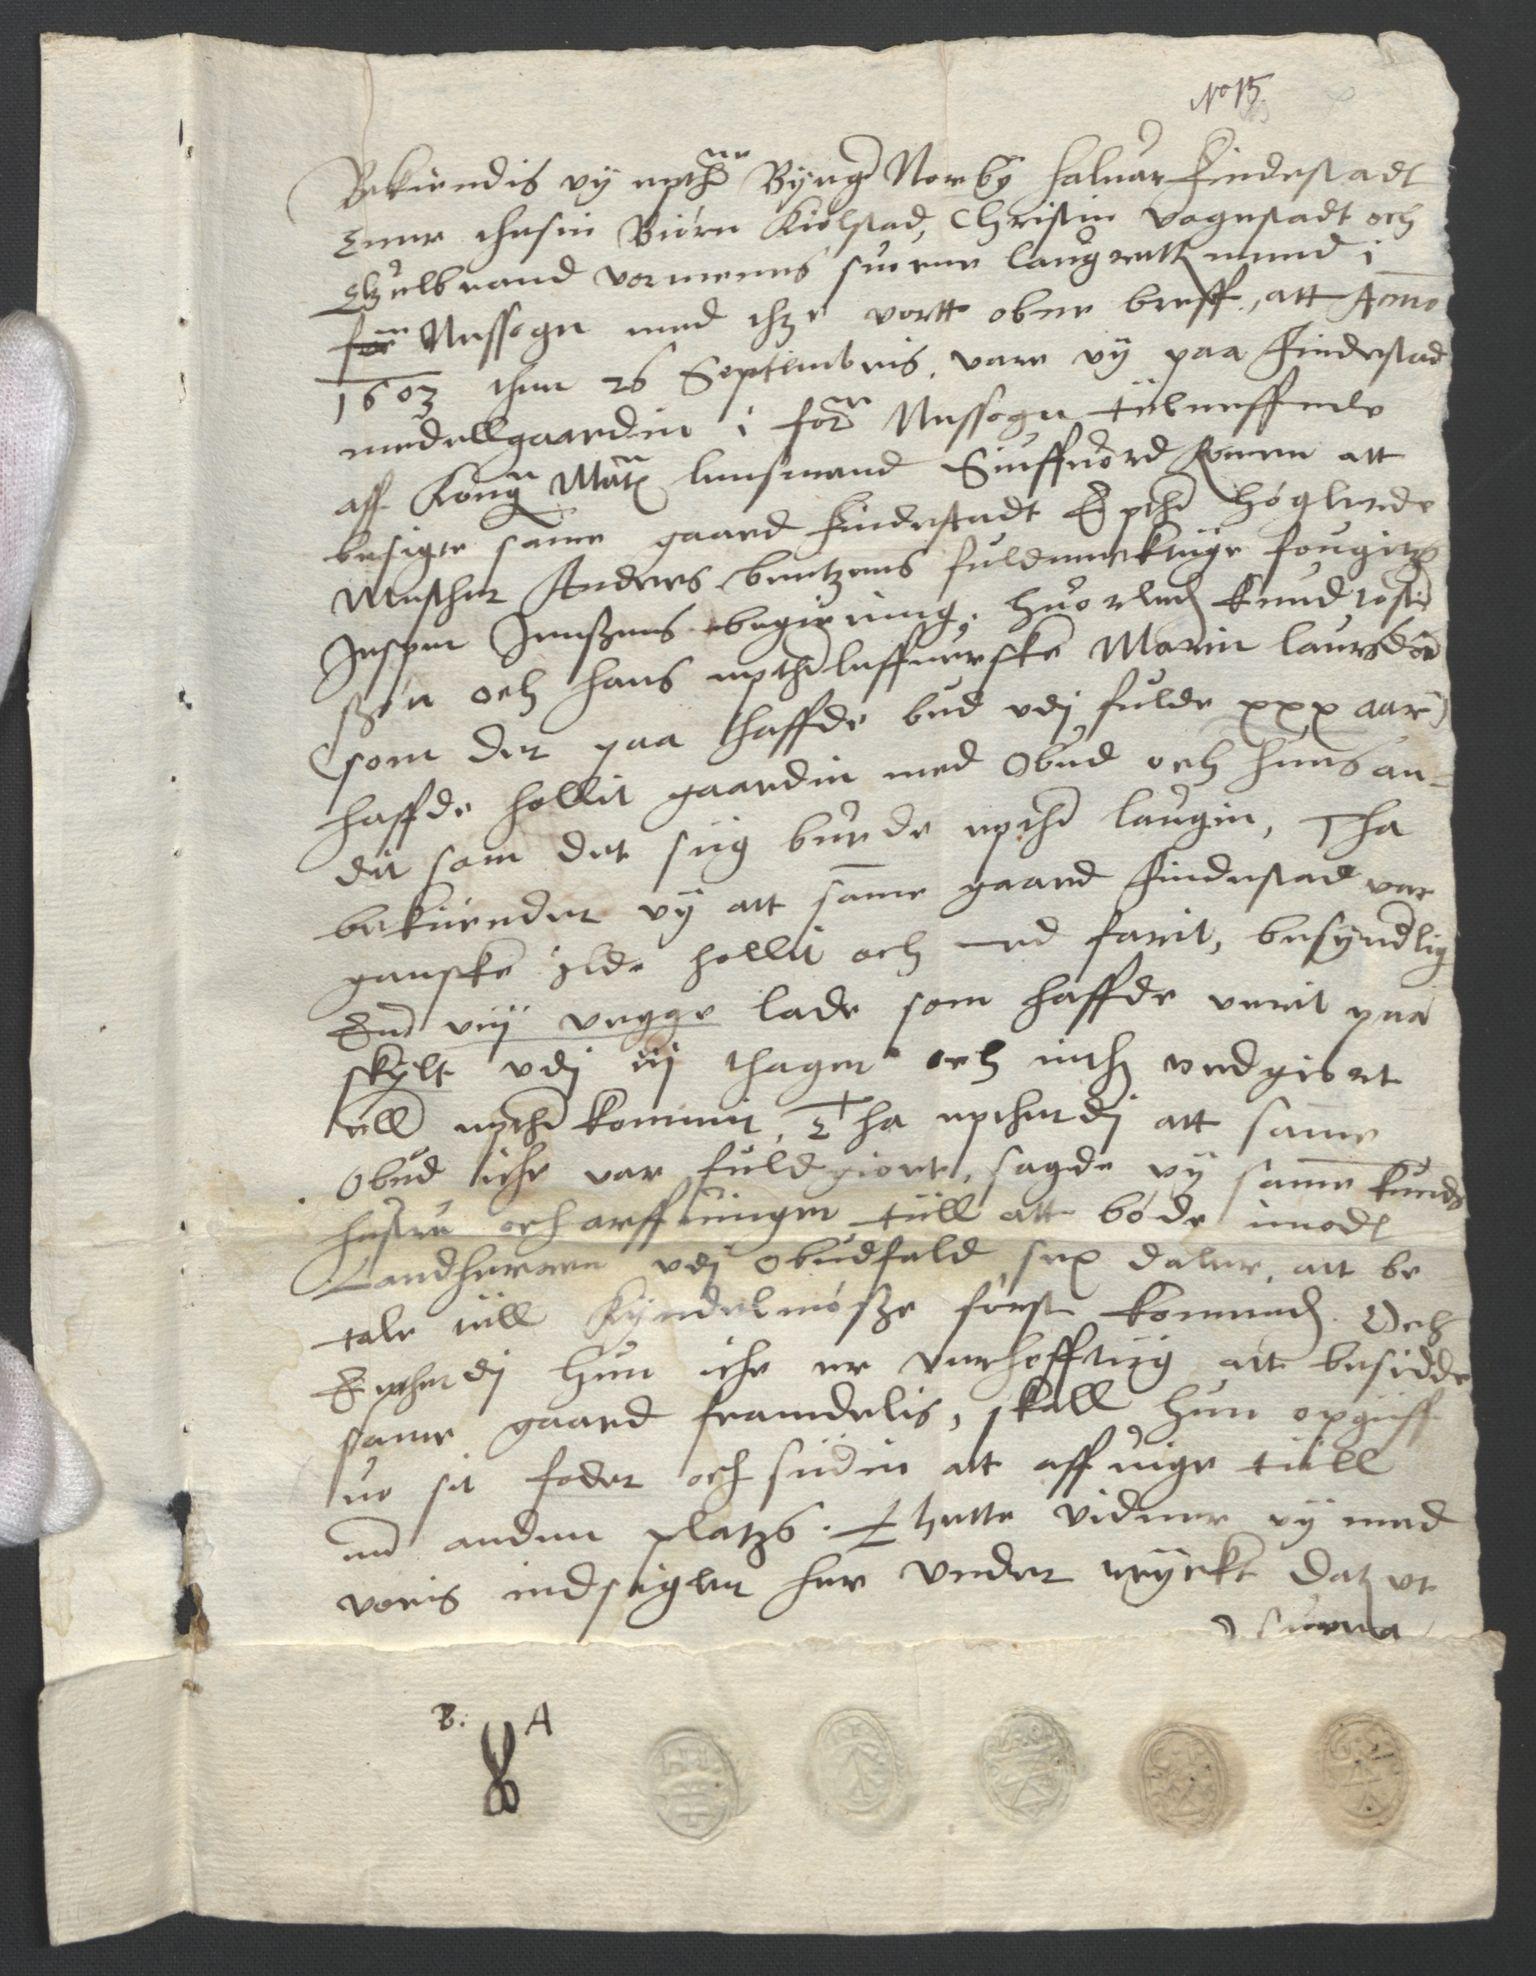 SAO, Oslo stiftsdireksjon, G/Gb/L0001: Bispestolens dokumenter, 1584-1612, s. 15